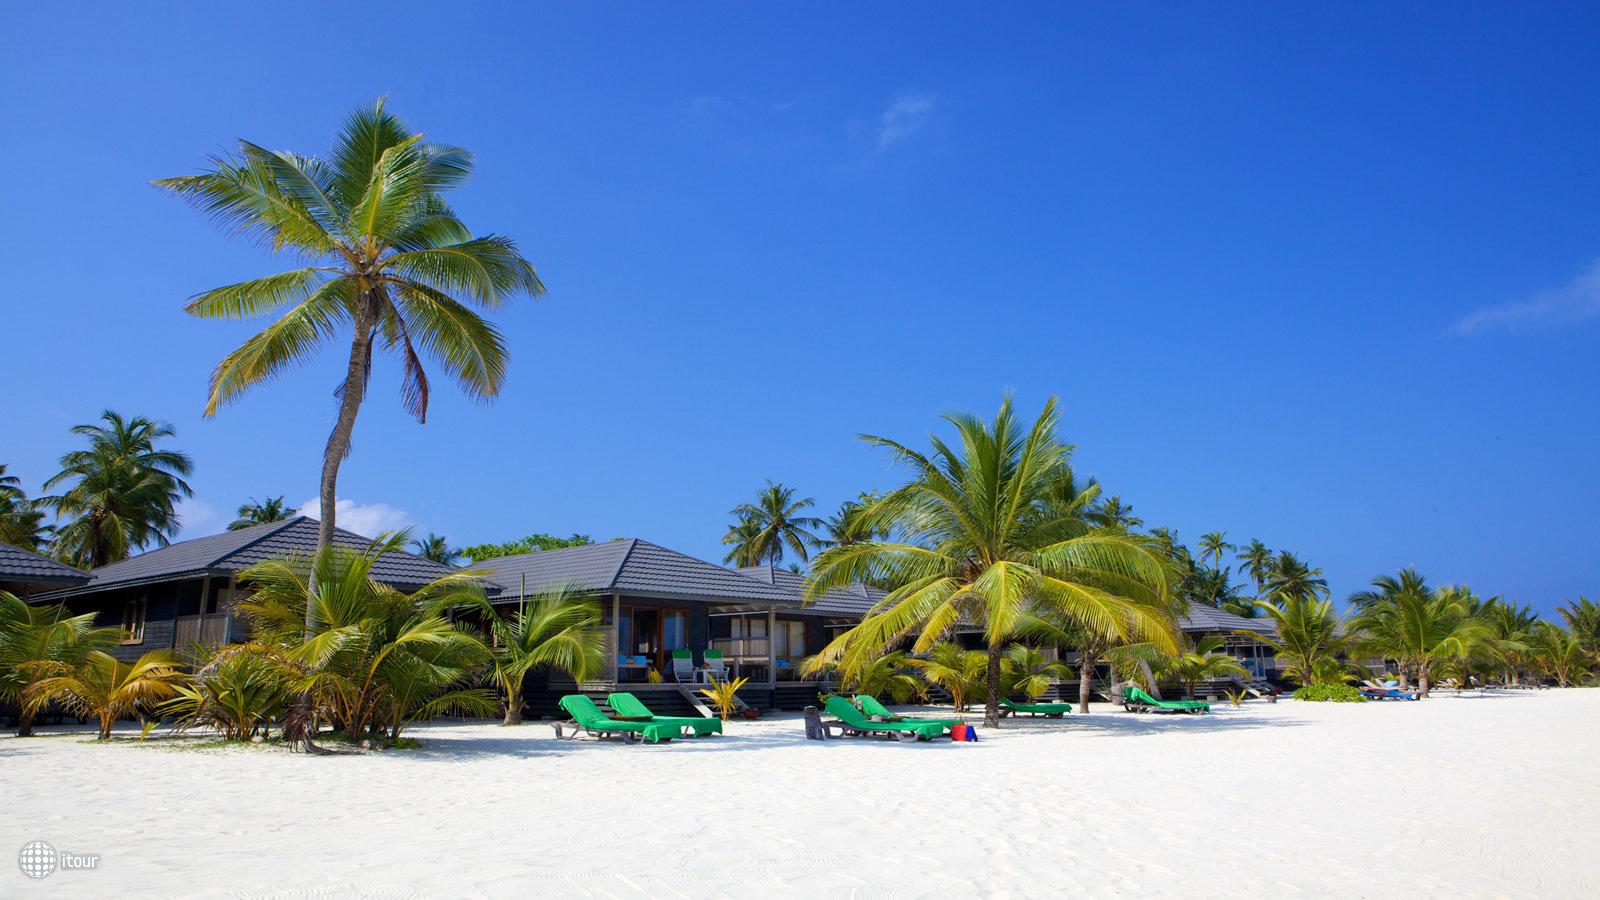 Kuredu Island 8